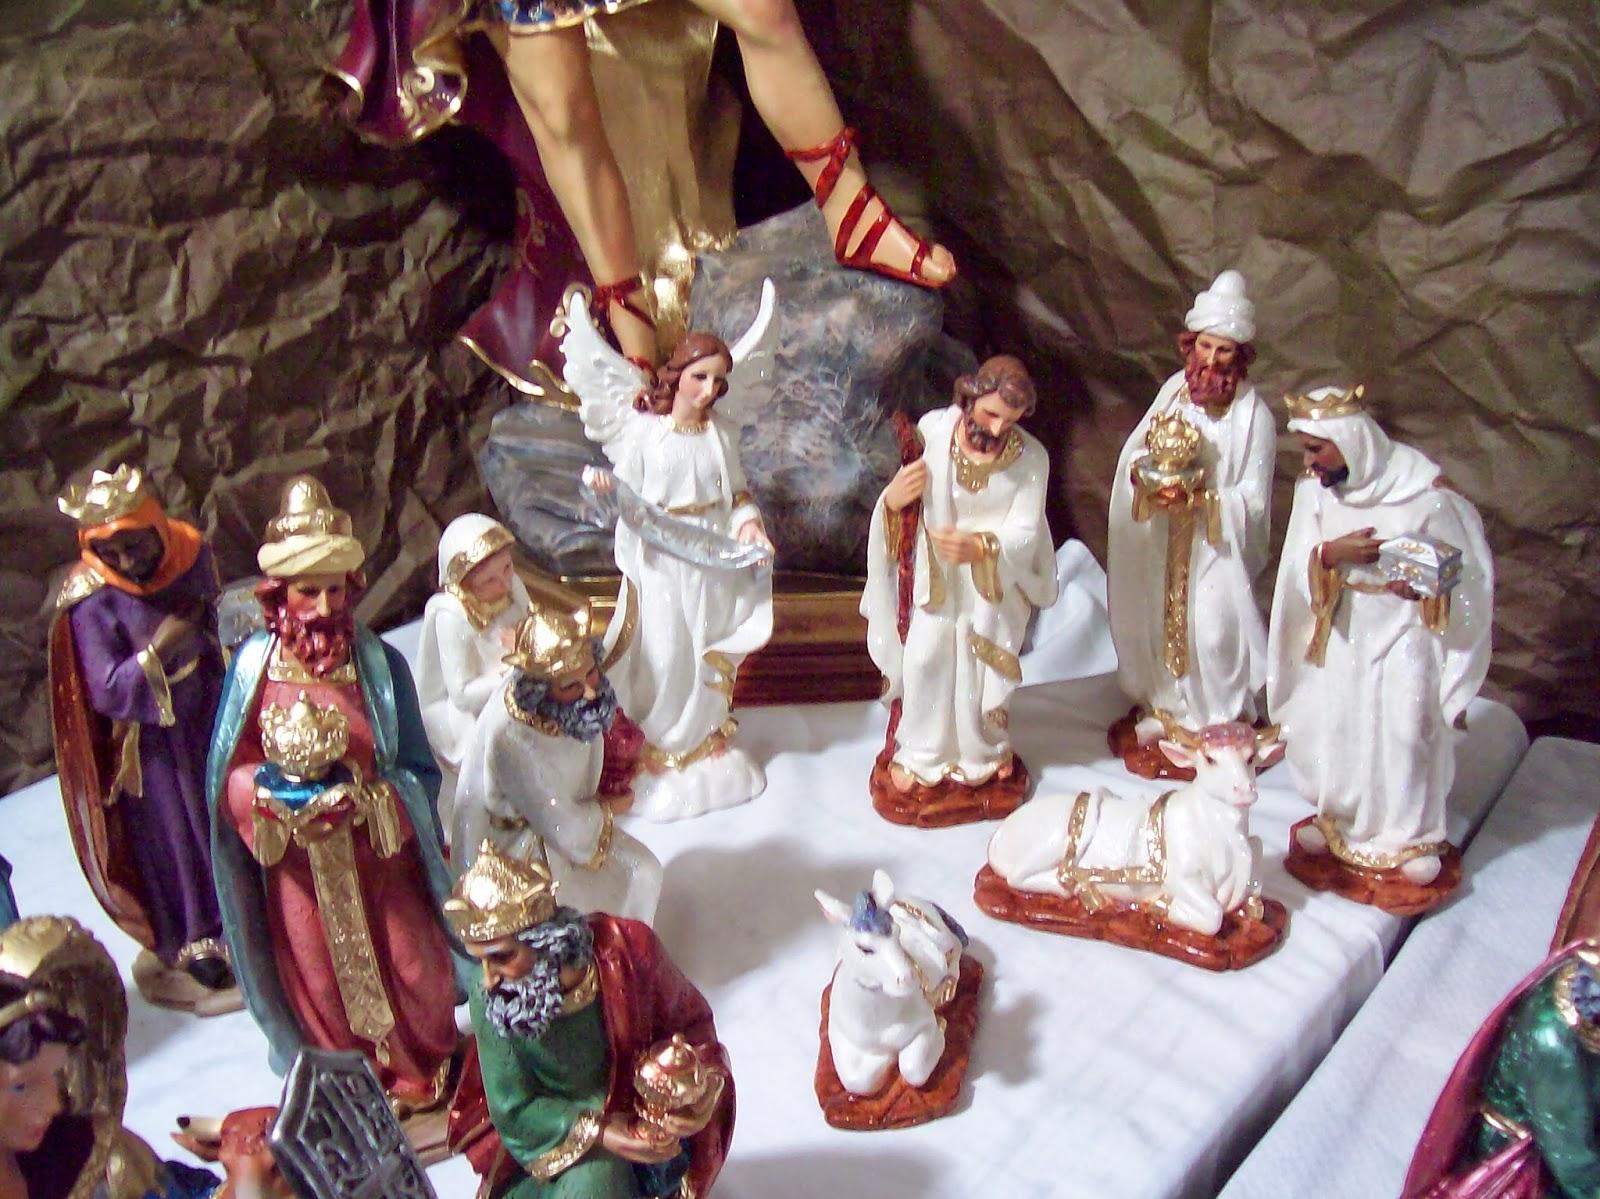 d1eece2e6fc STA. EDUWIGES ARTICULOS RELIGIOSOS  NACIMIENTOS